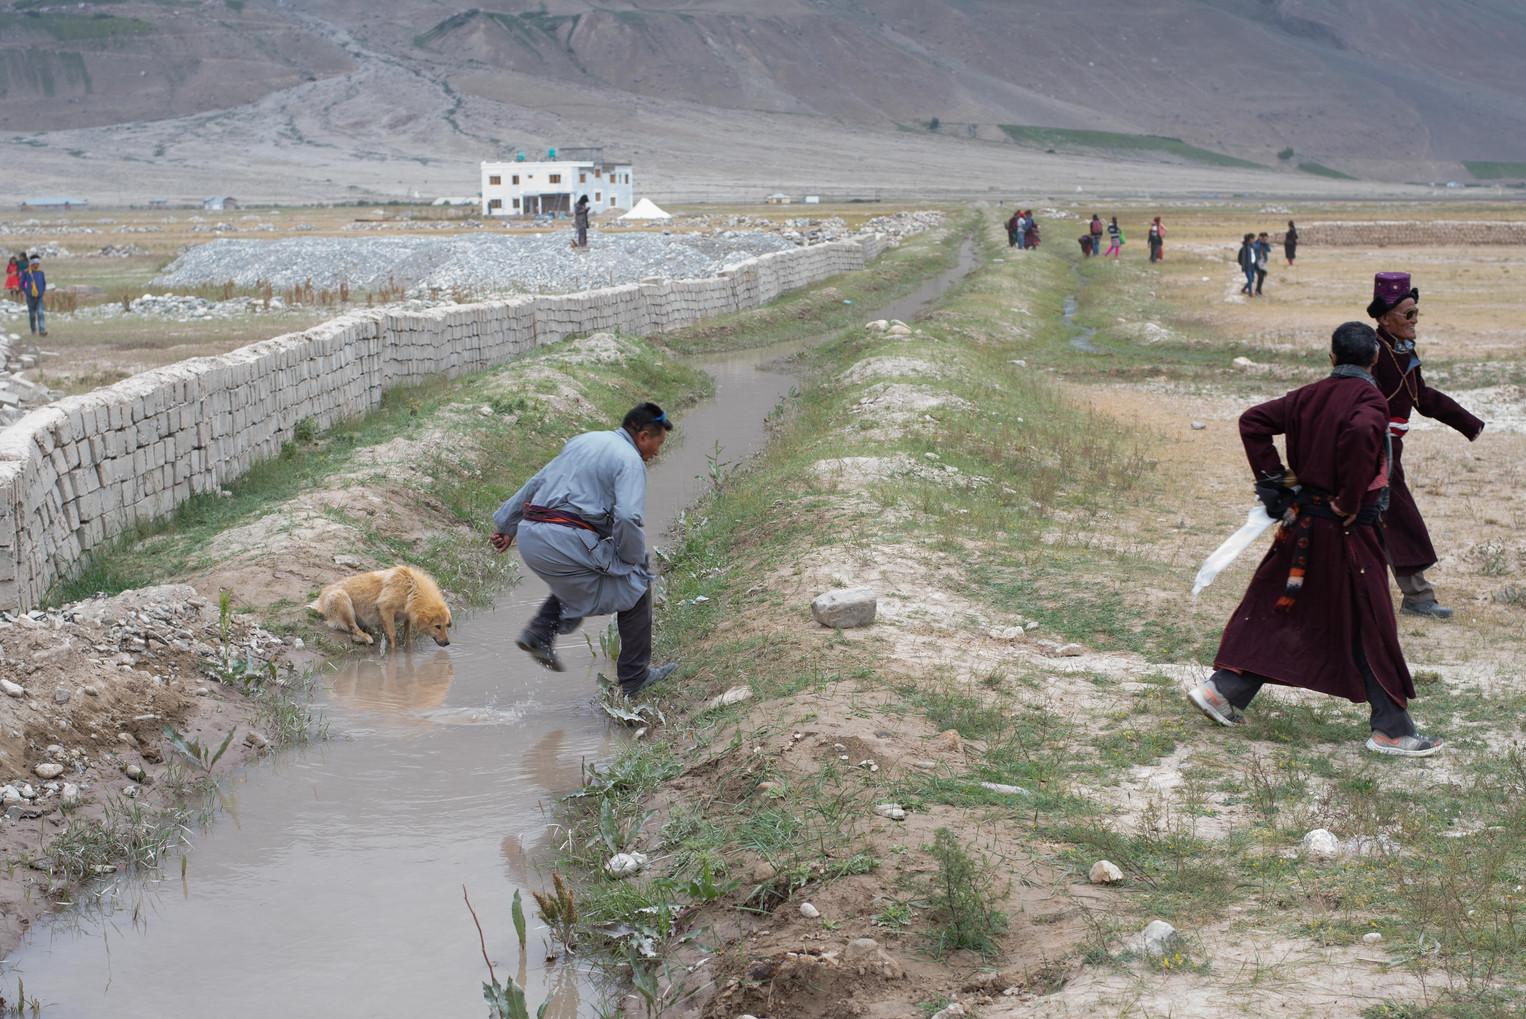 On their way to meet the Dalai Lama  - Padum, Zanskar July 2018